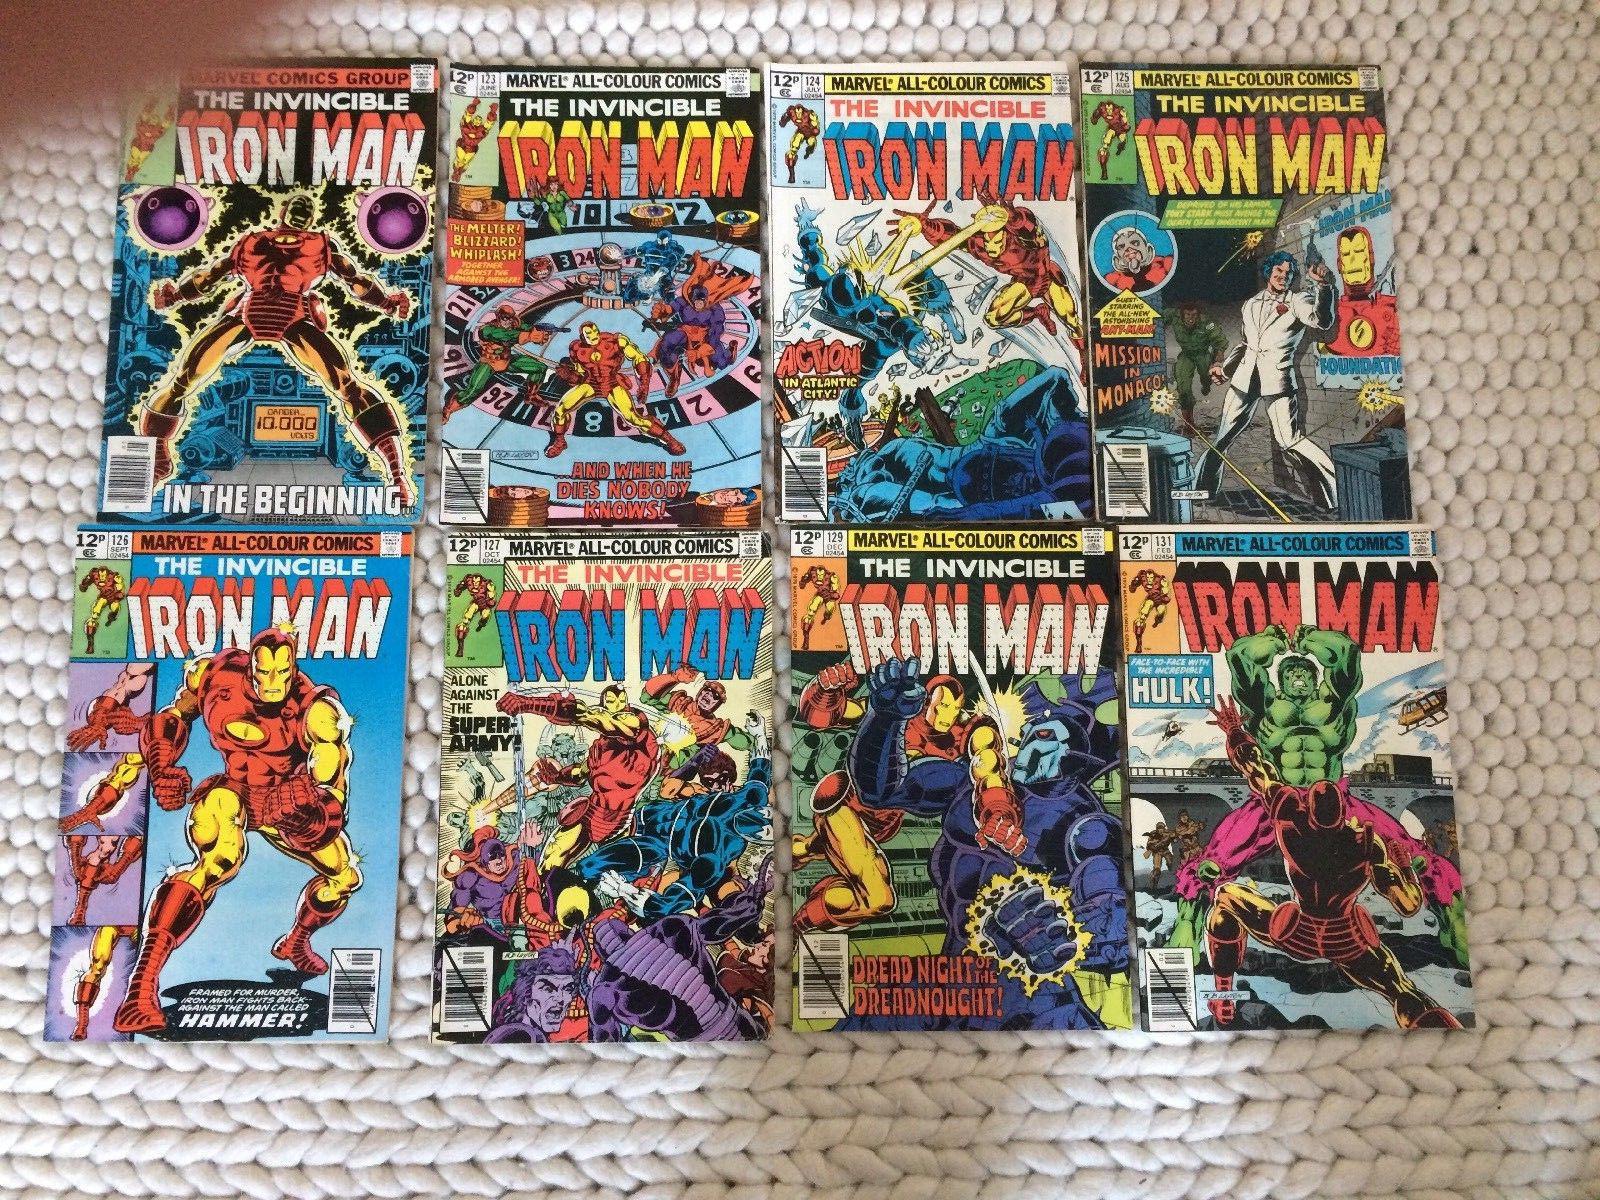 MARVEL COMICS LOT BRONZE-AGE IRON MAN 122-131 - EIGHT ISSUES HULK, ANT-MAN